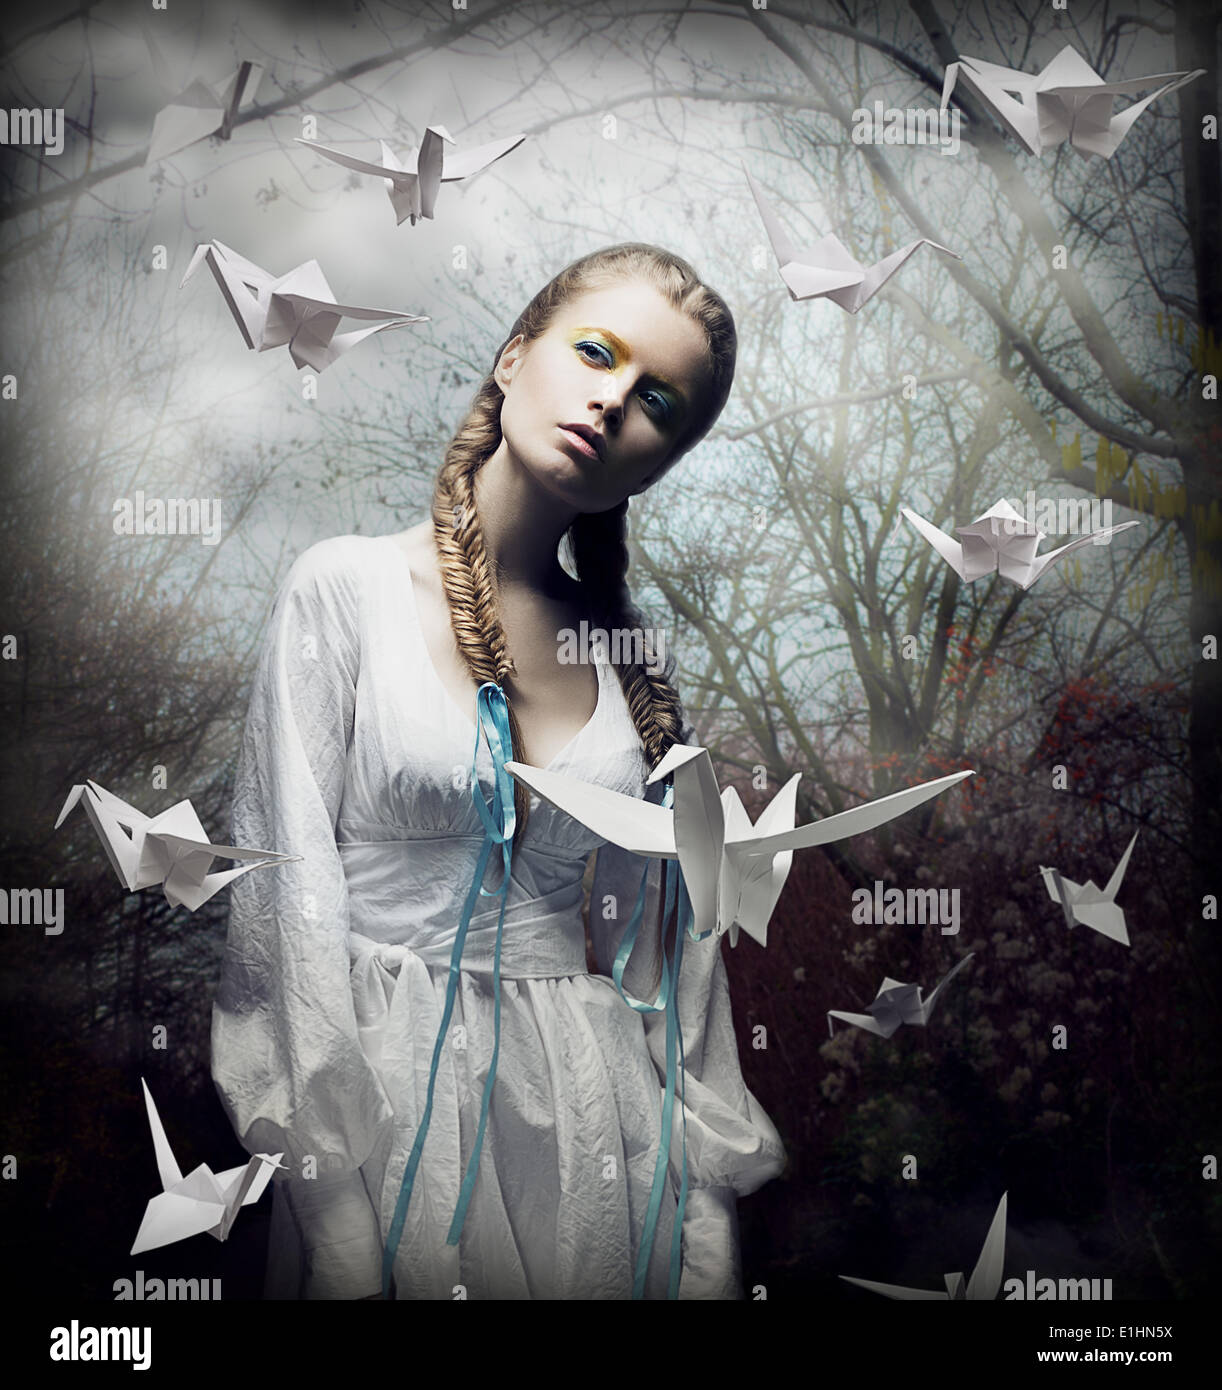 Phantasie. Romantische Blondine mit Origami-Vögel in gruseligen Wald schweben. Magie Stockbild